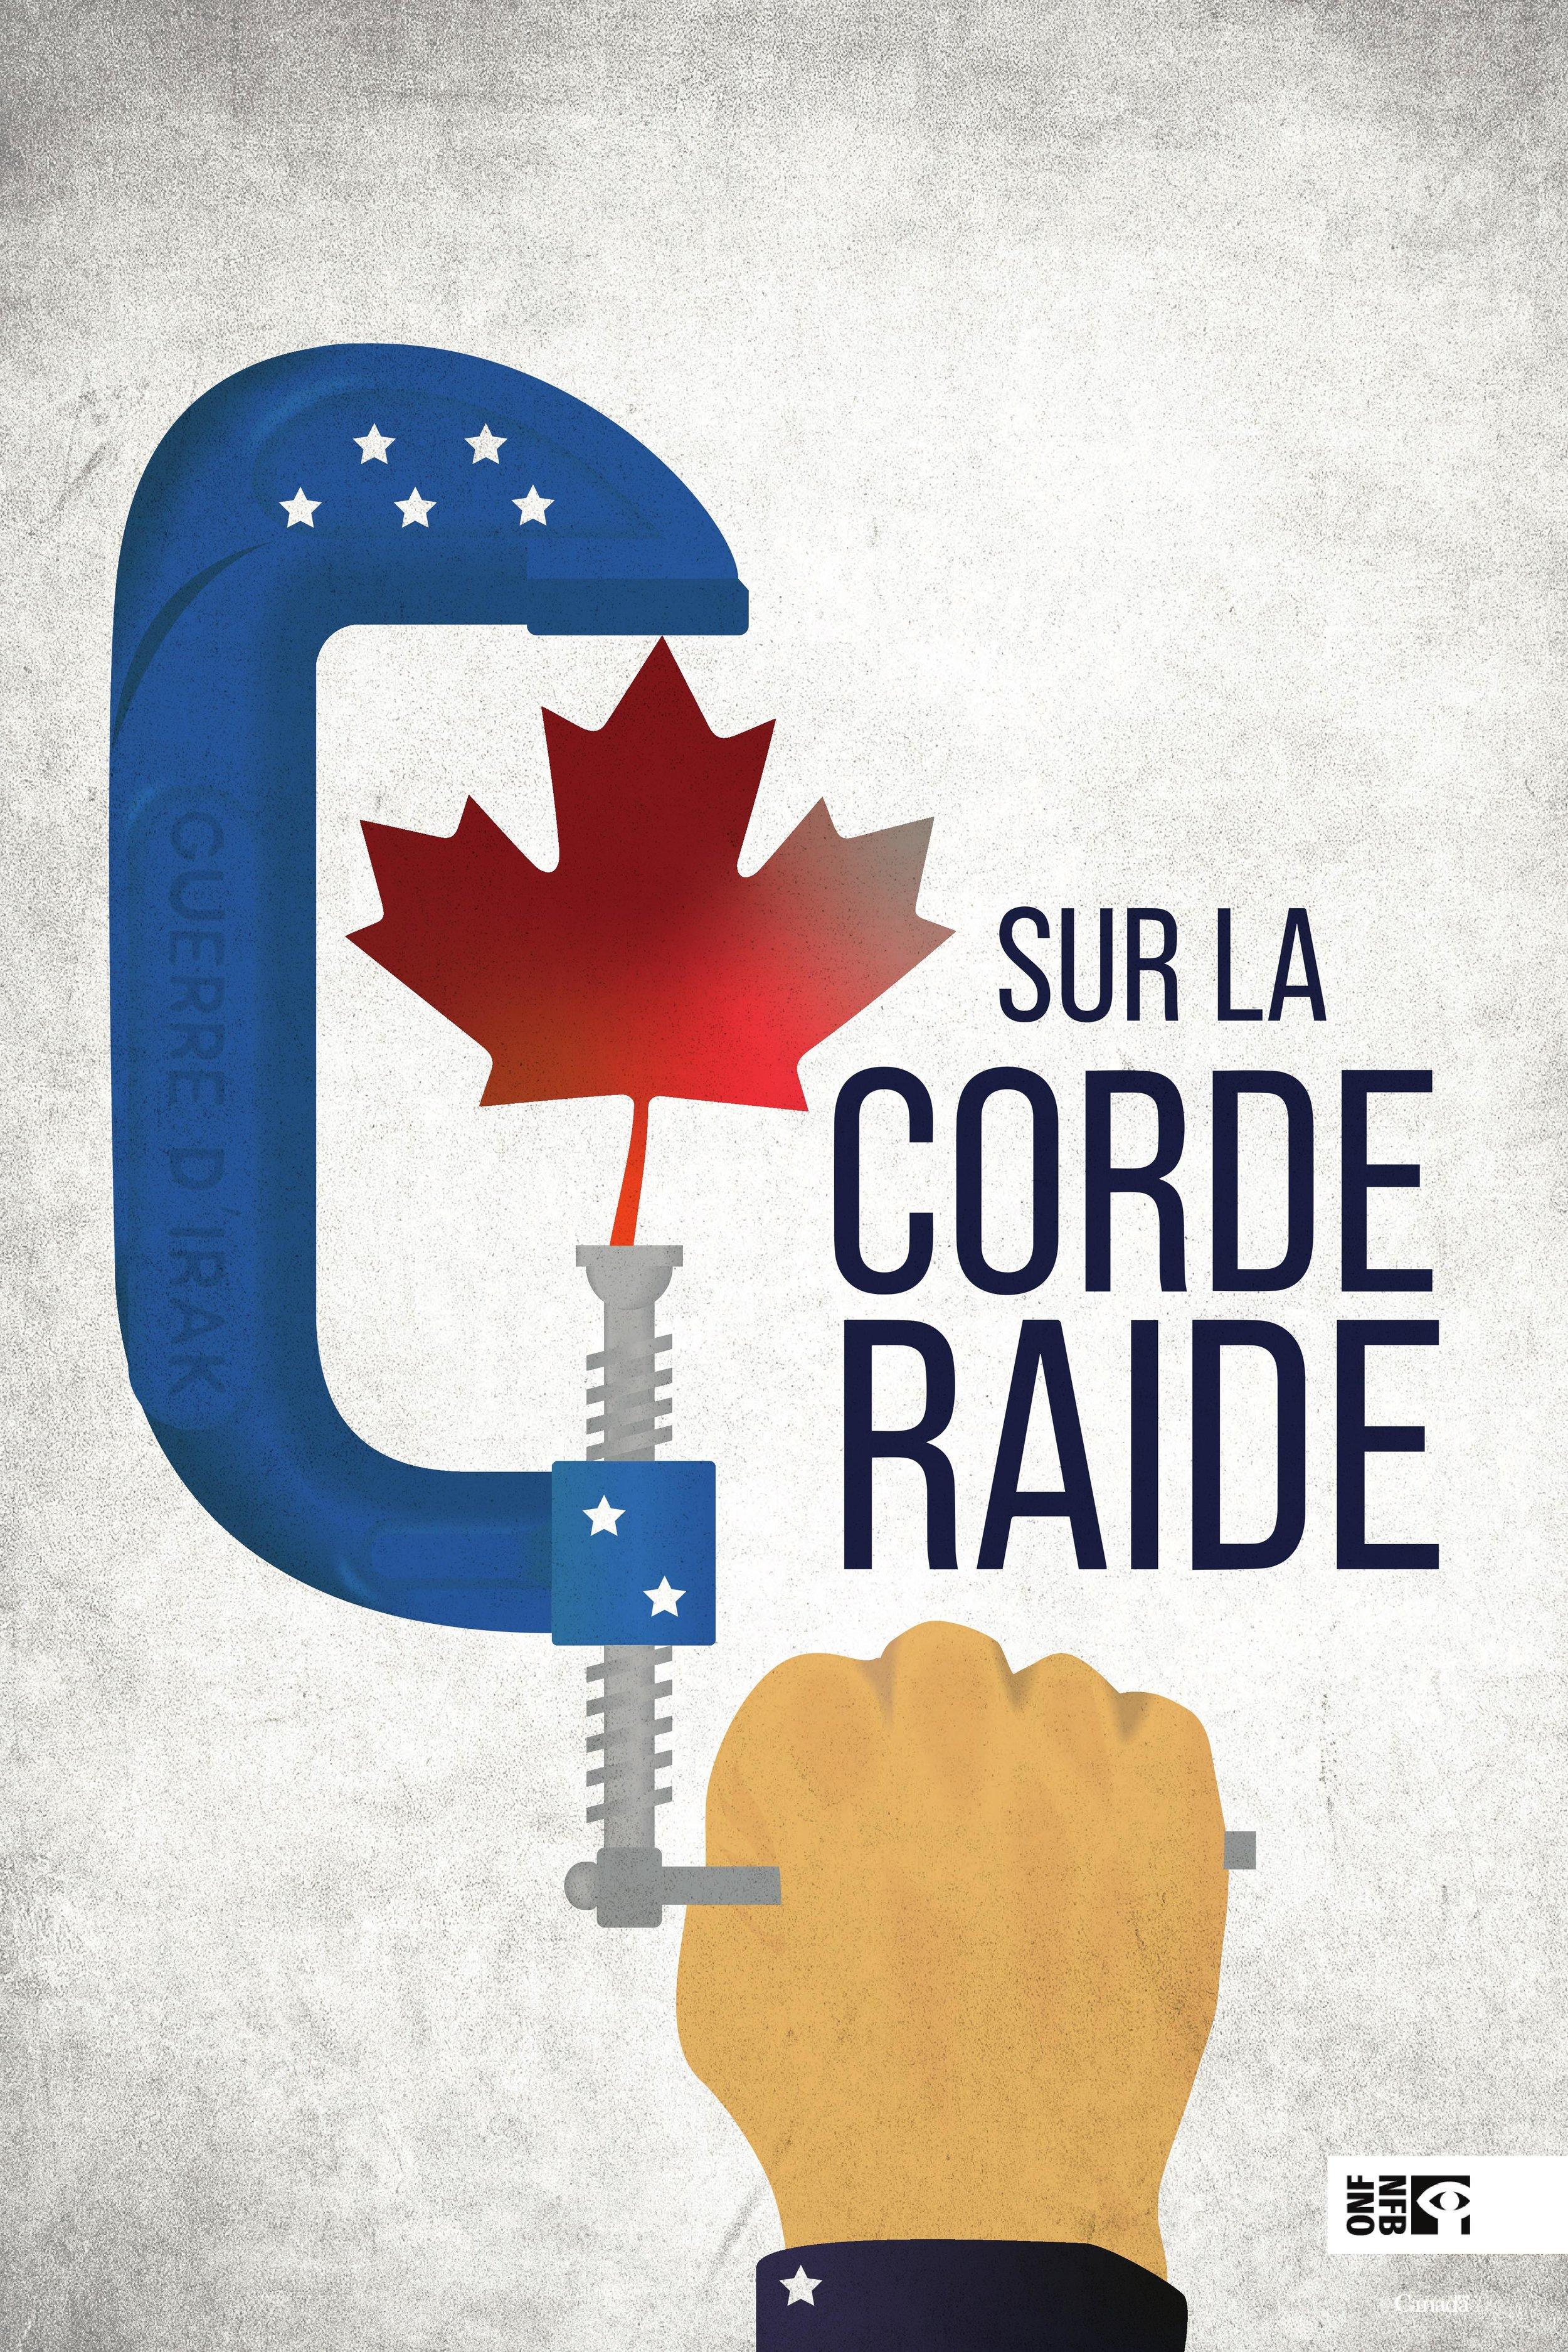 SURLACORDERAIDE-LaCamaraderie-Poster-1mars-01 (1)_00009.jpg